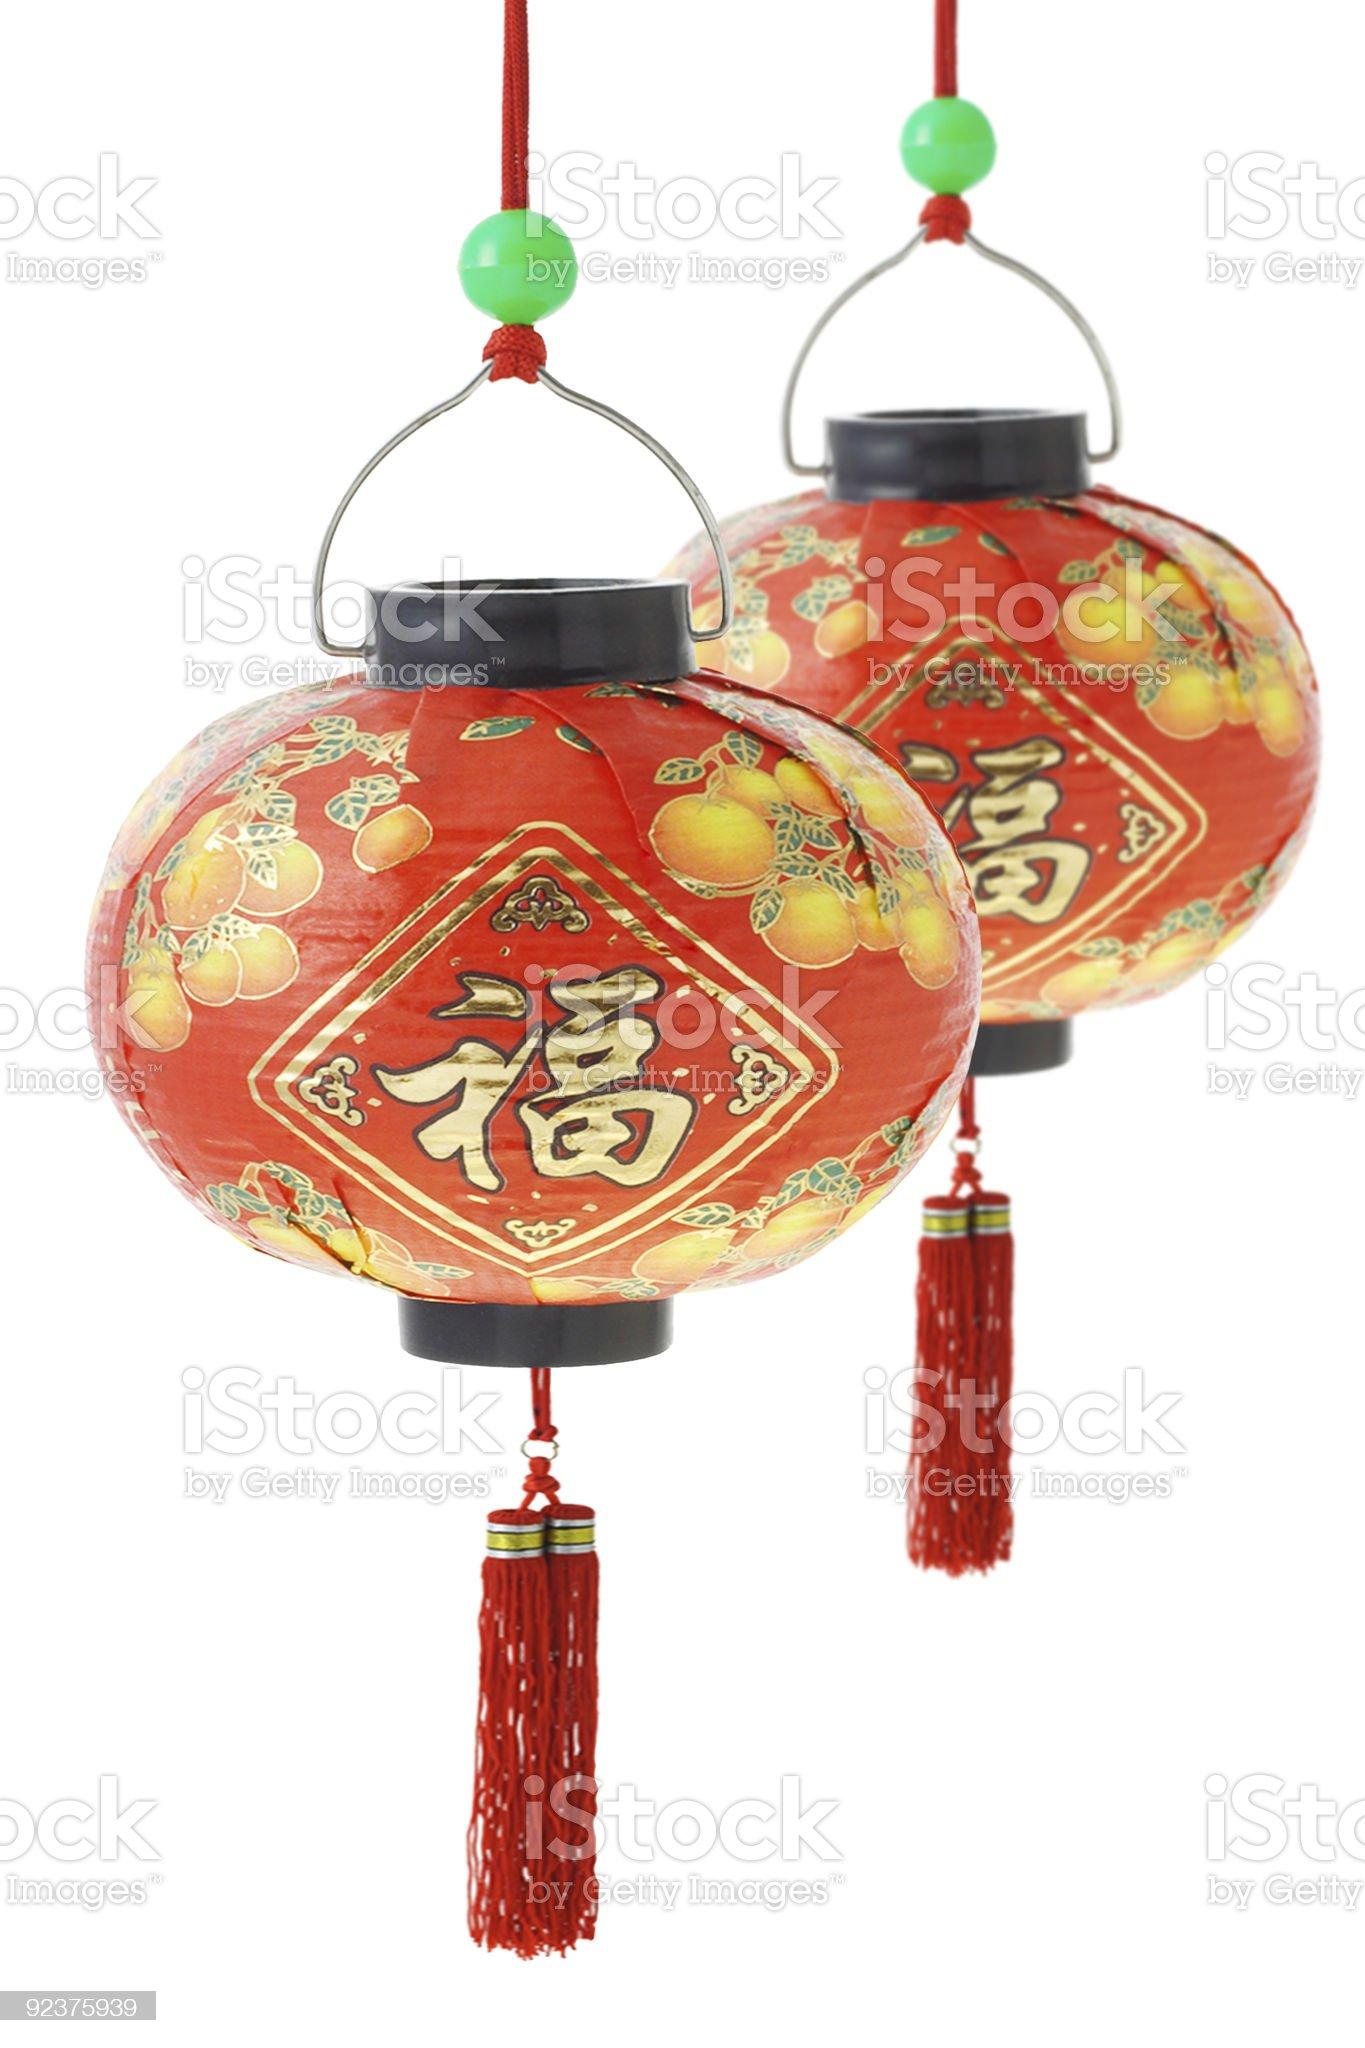 Chinese prosperity lanterns royalty-free stock photo